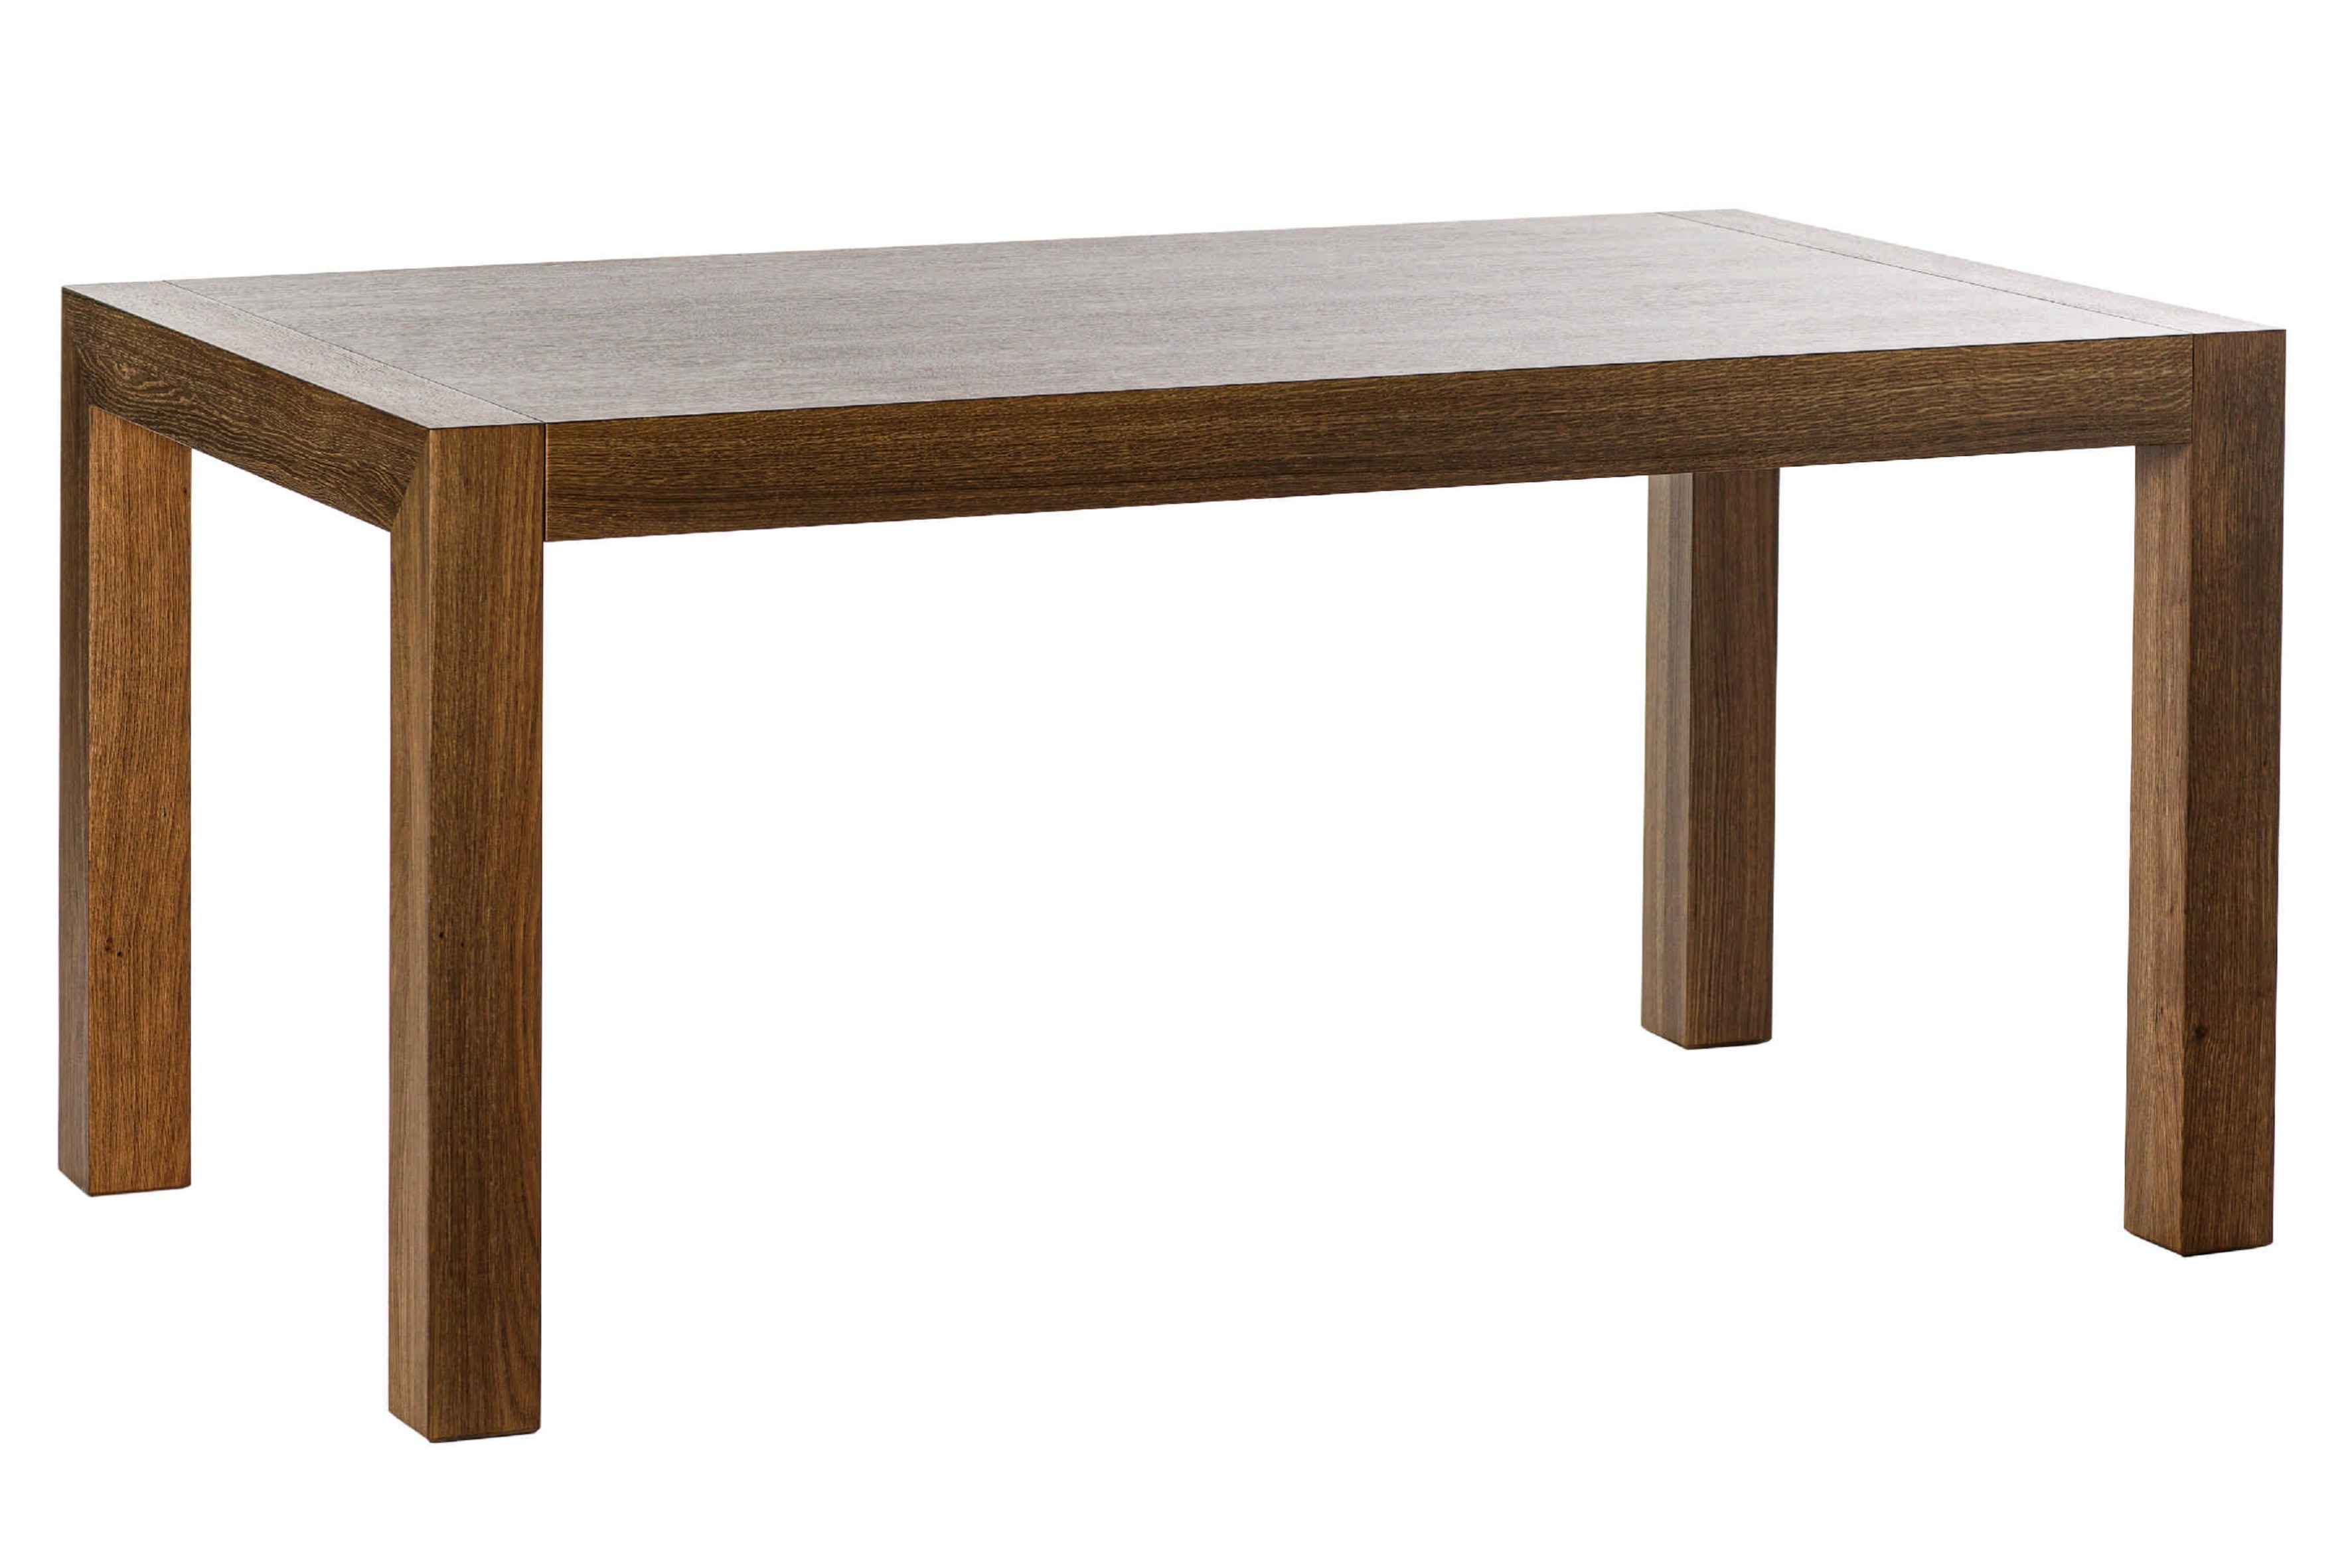 EDITA TABLE